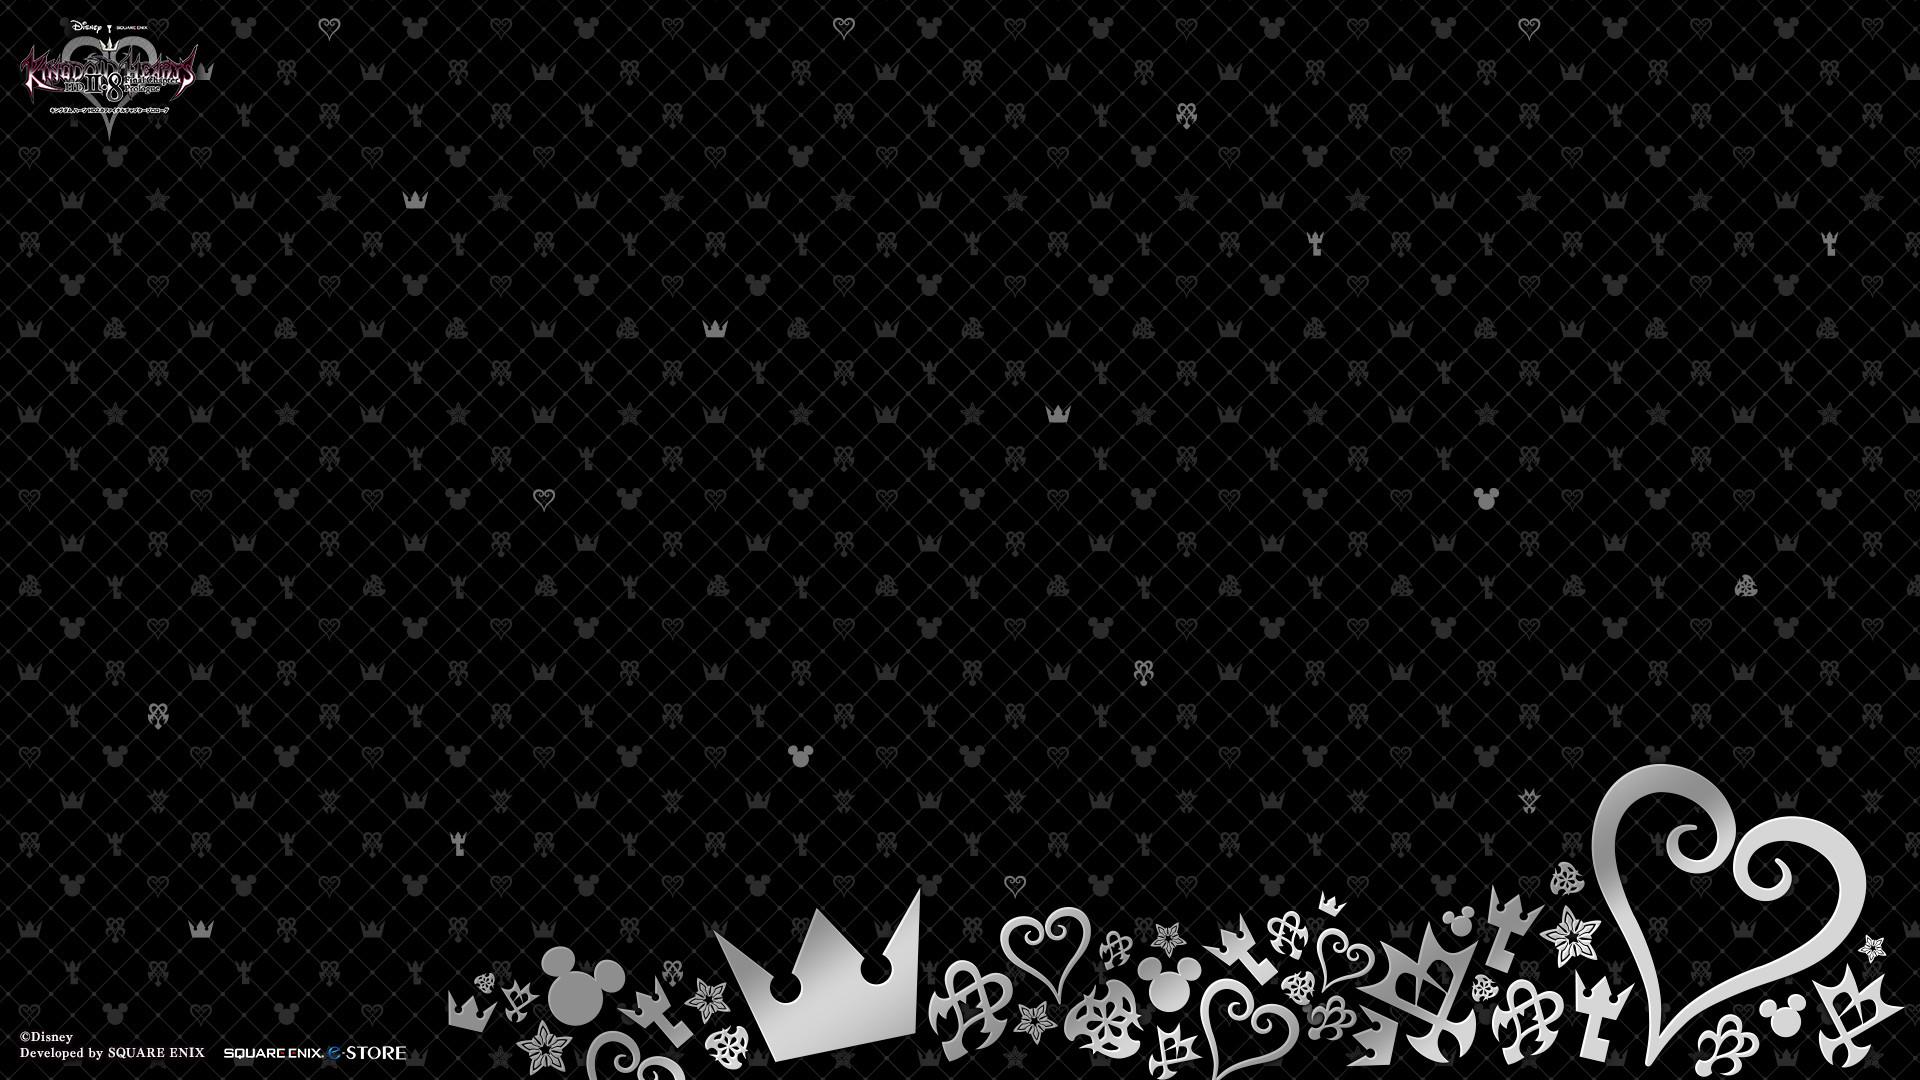 Fantastic Wallpaper Mac Kingdom Hearts - 979404-kingdom-hearts-background-1920x1080-for-hd-1080p  Trends_161965.jpg